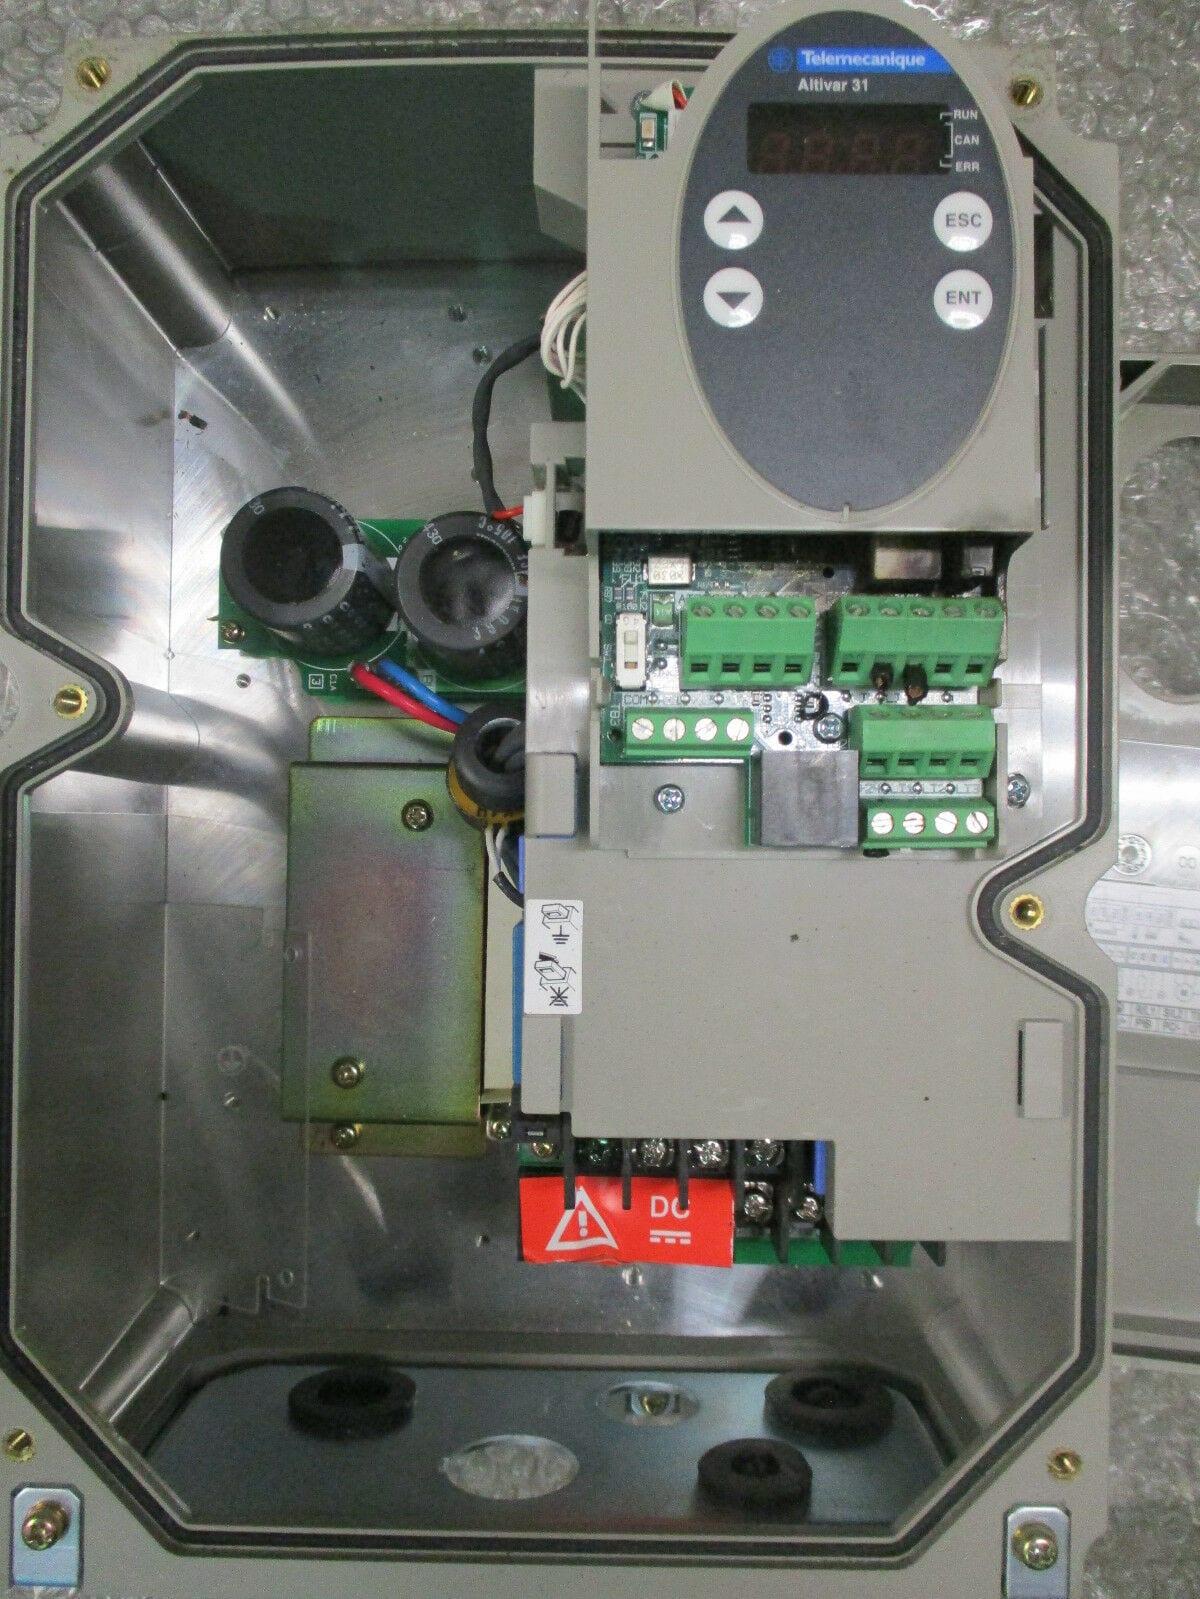 Telemecanique ATV31C075N4 Altivar 31 AC Drive 380/500VAC 1HP/ 75kW *Tested